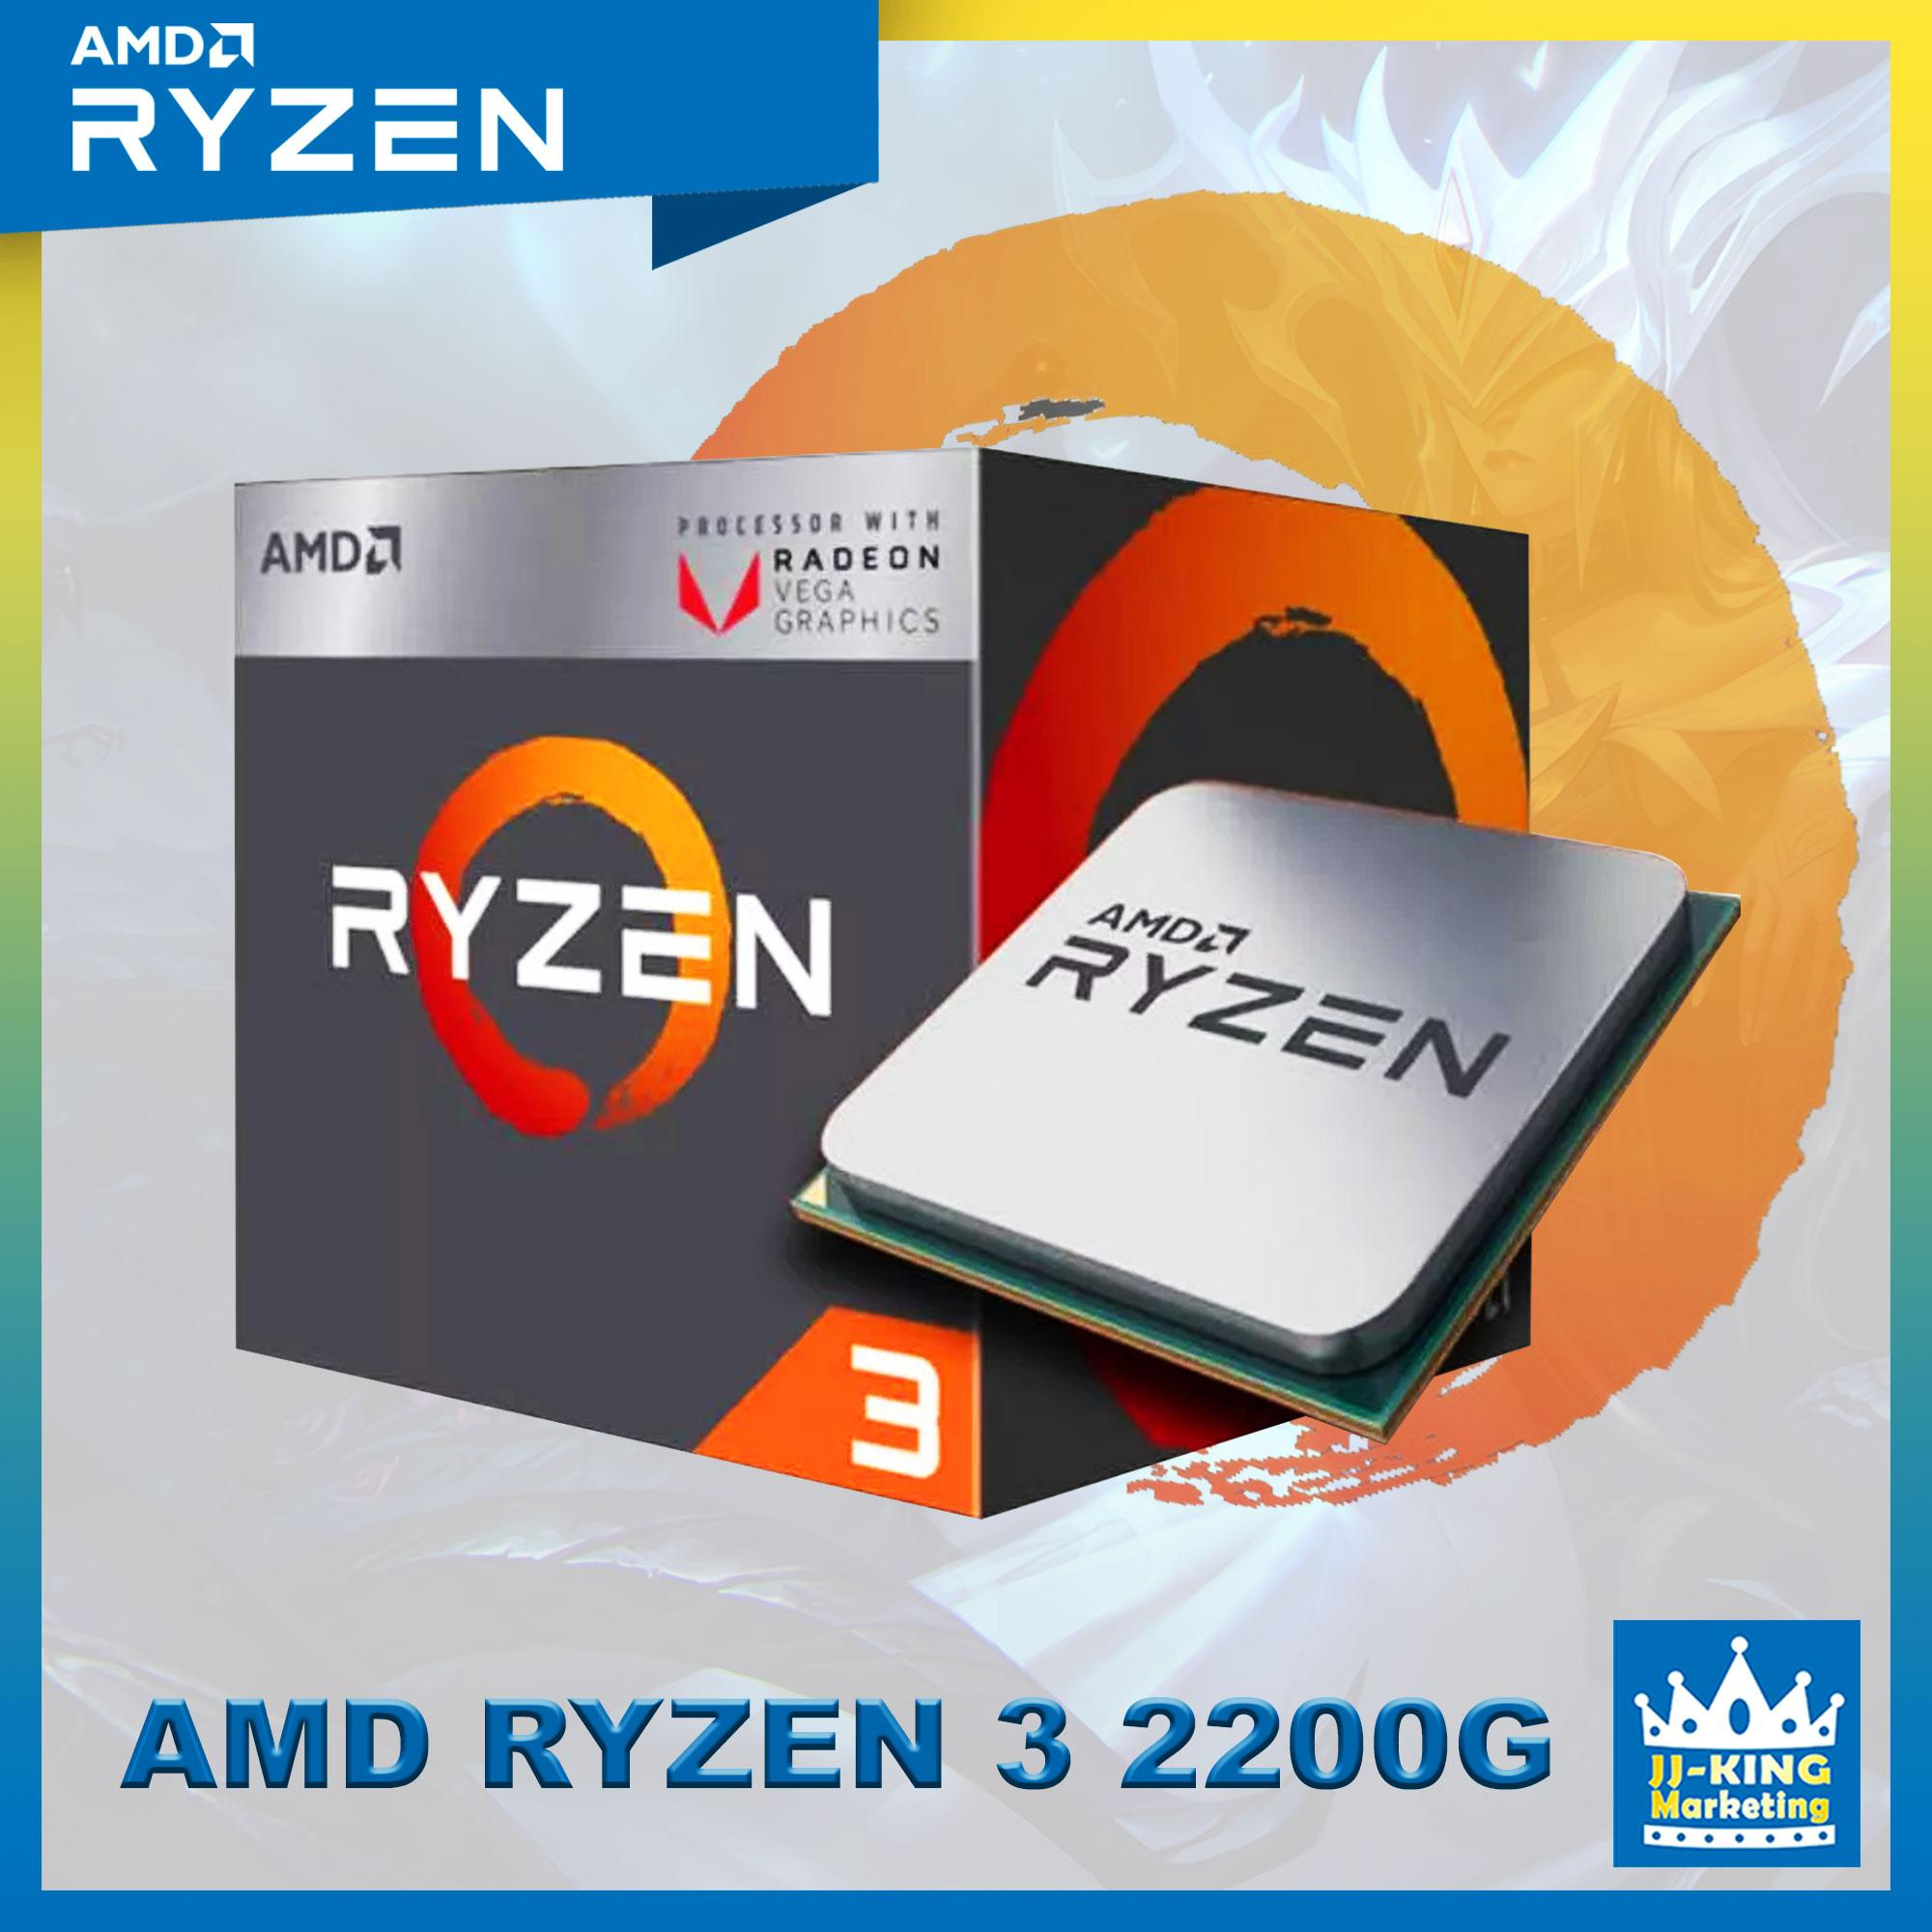 Amd Ryzen 3 2200G Processor Socket Am4 3 5ghz with Radeon Vega 8, Ryzen3  2nd Gen APU, Ryzen 3 2200G Gaming processor